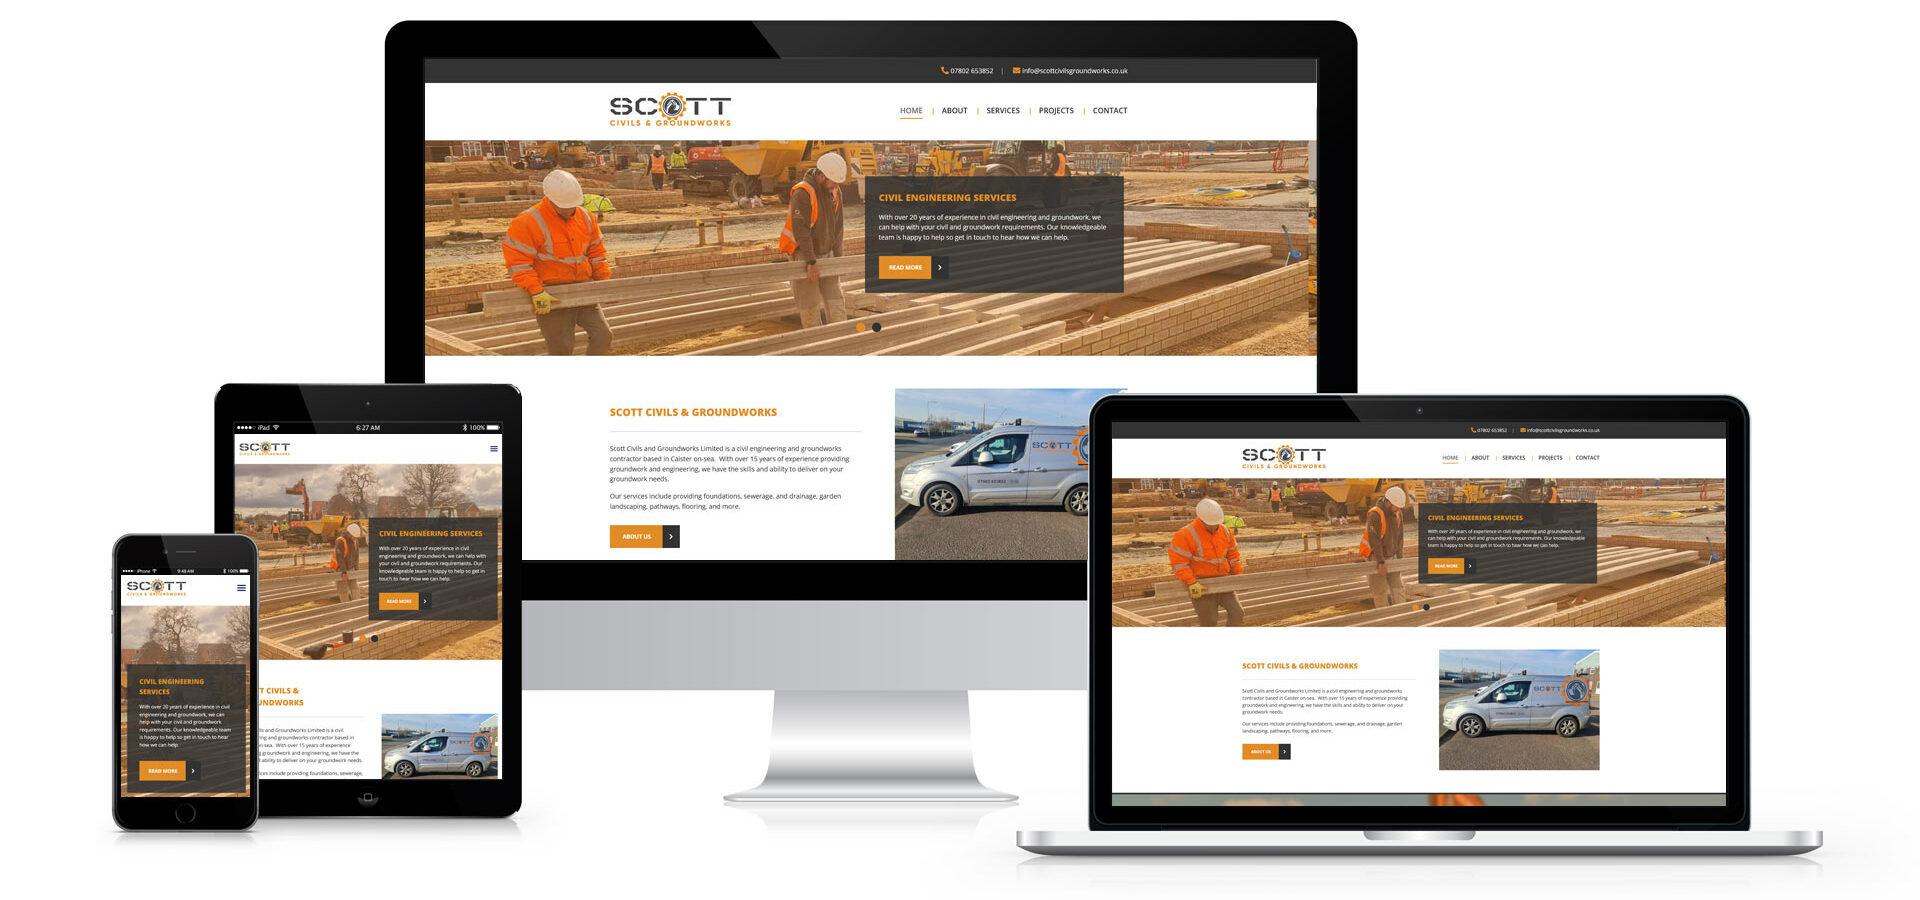 Scott Civils and Groundworks Website Design